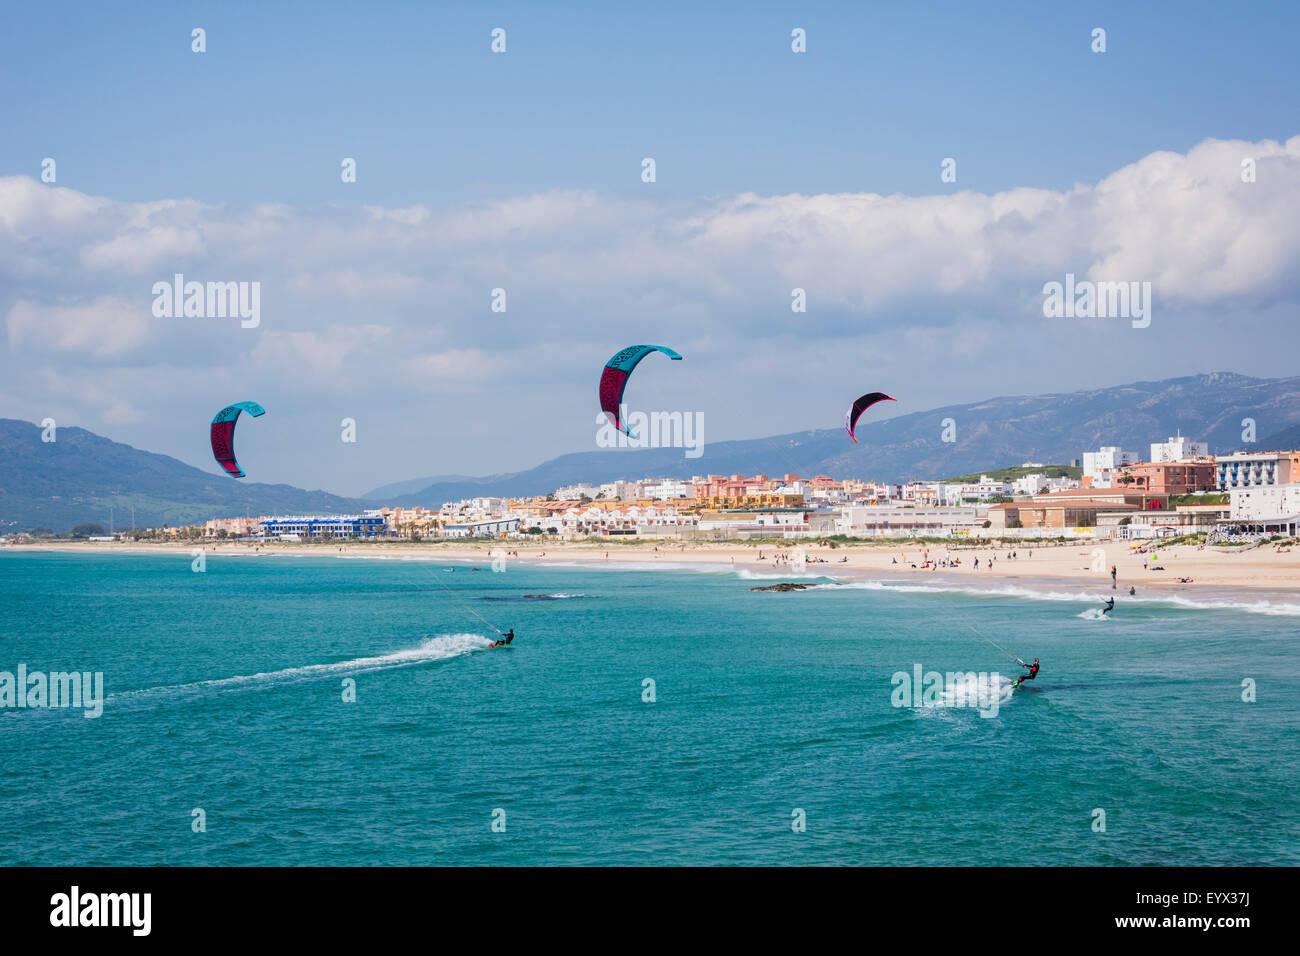 Tarifa, Cadiz Province, Costa de la Luz, Andalusia, southern Spain.  Kitesurfing off Playa de los Lances. Stock Photo